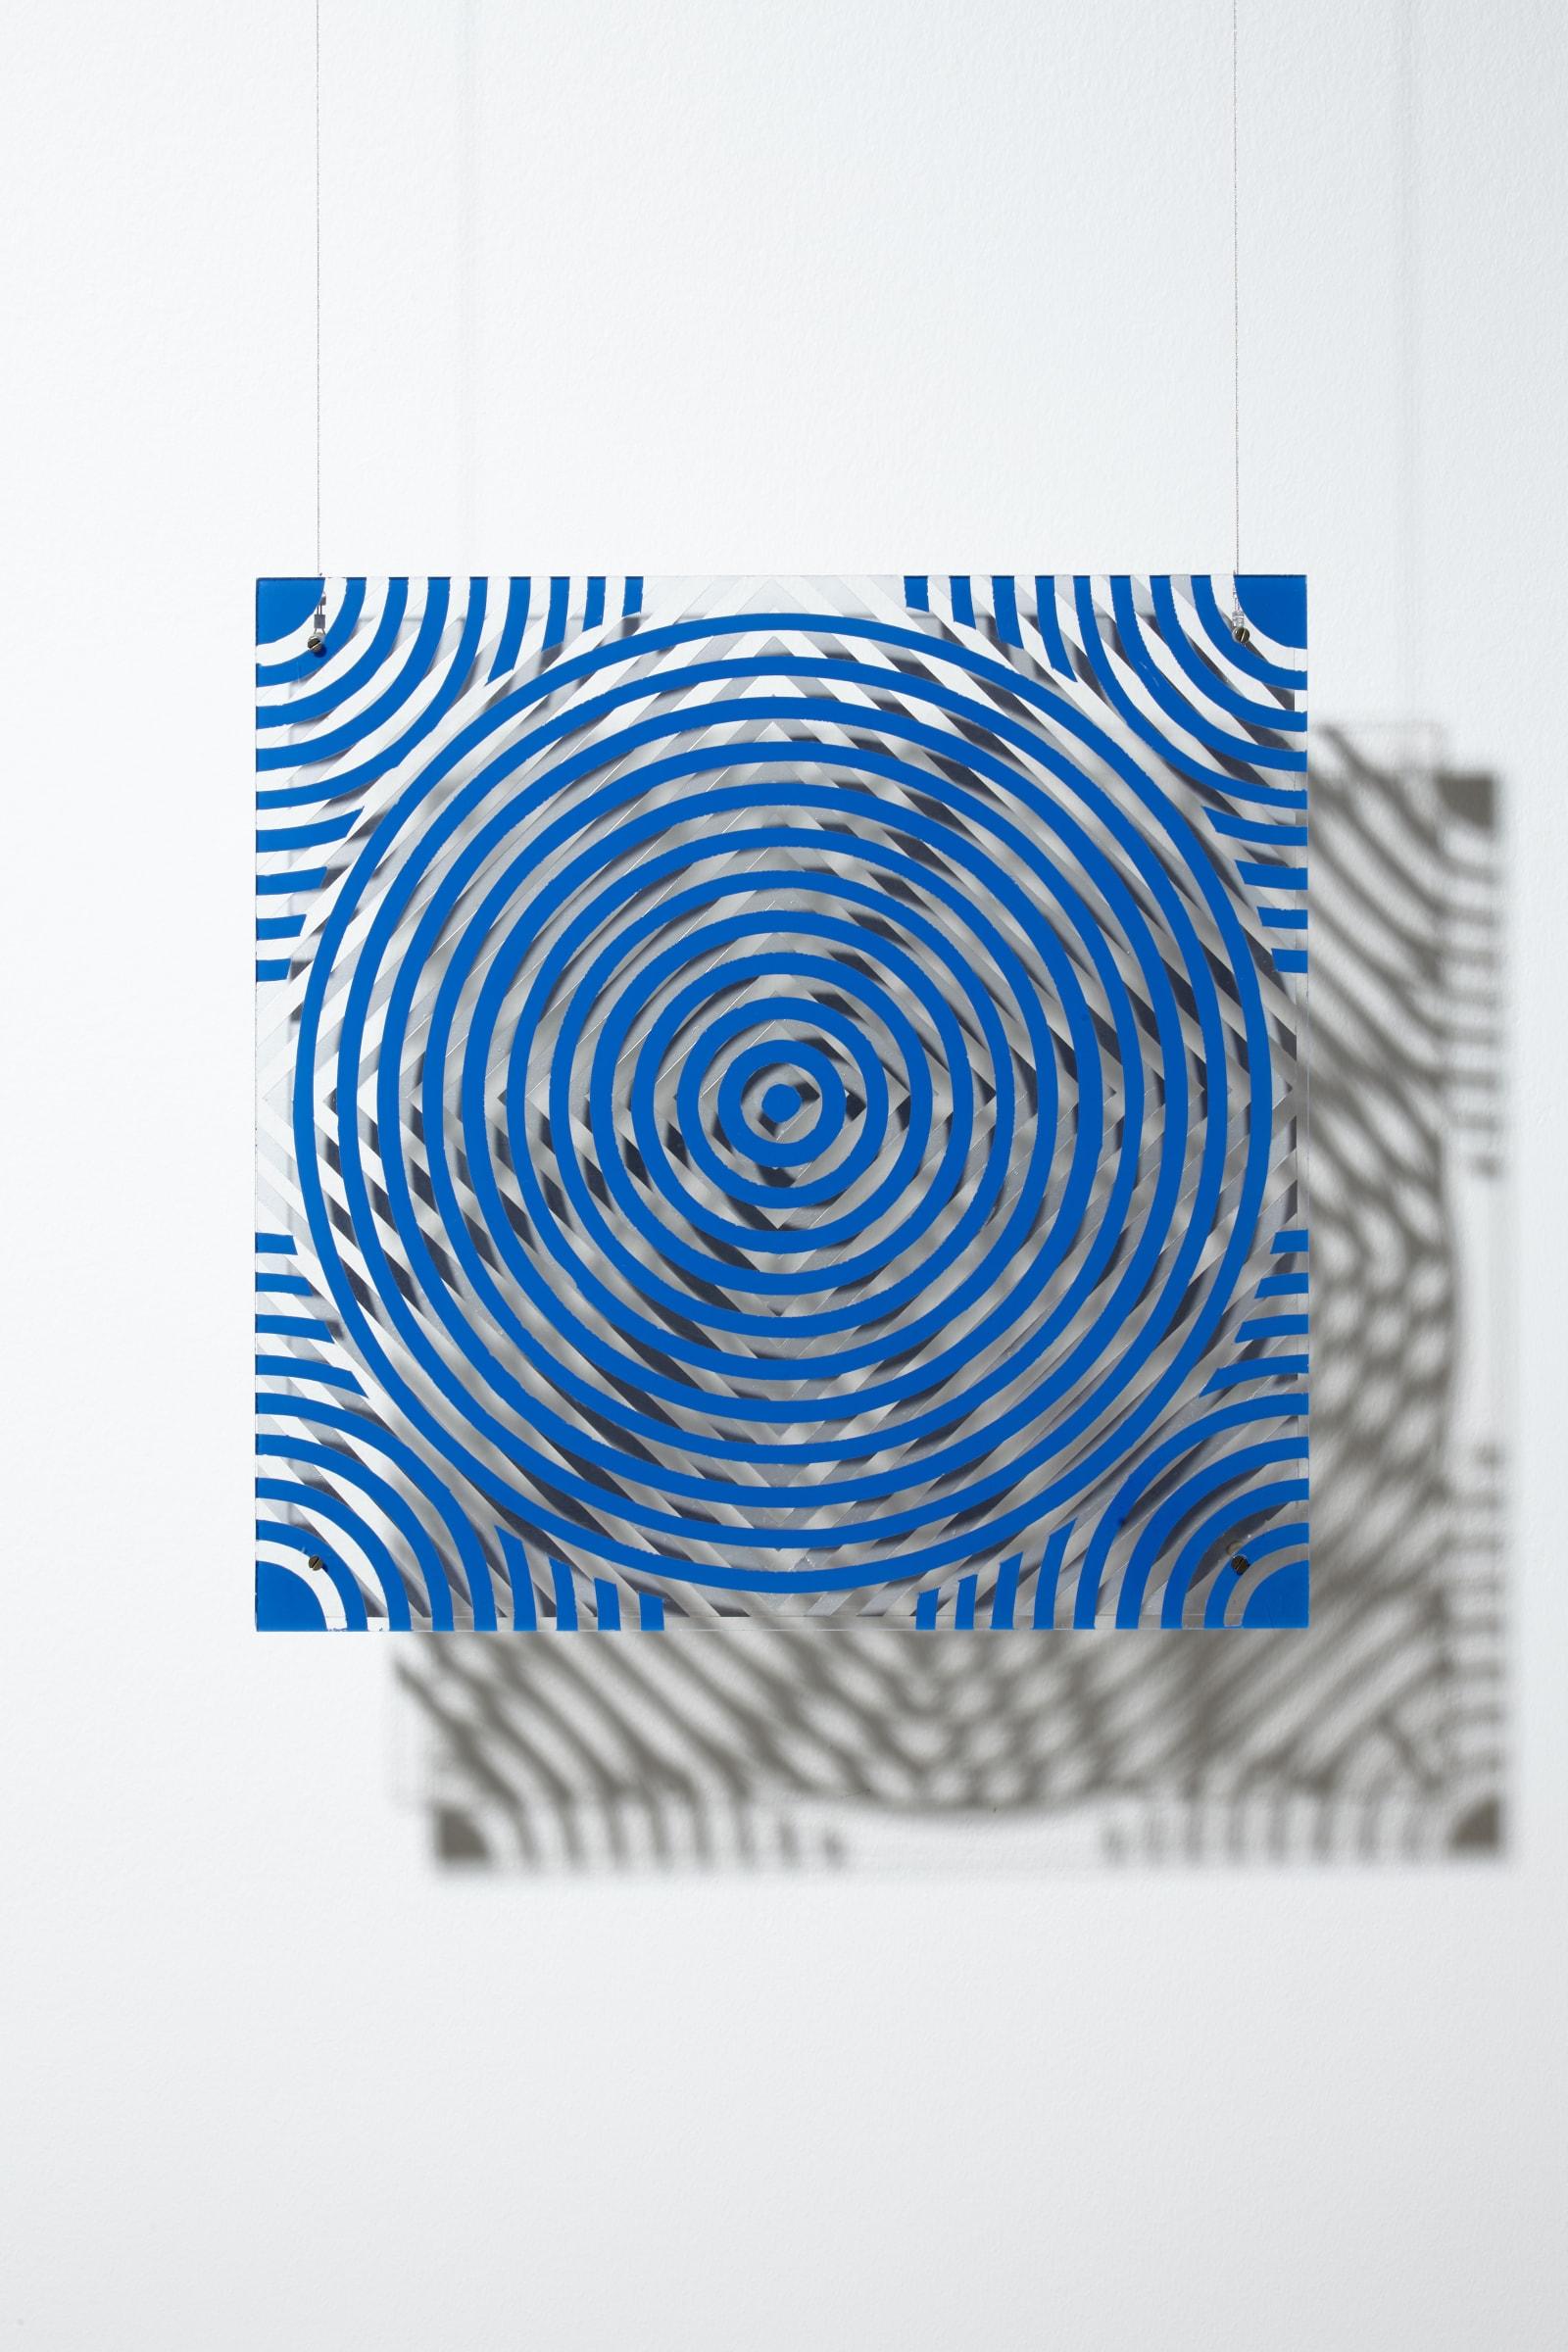 "<span class=""link fancybox-details-link""><a href=""/exhibitions/171/works/artworks16027/"">View Detail Page</a></span><div class=""artist""><strong>Eyborg Guðmundsdóttir</strong></div><div class=""title""><em>Untitled </em>, 1974</div><div class=""medium"">acrylic on 2 pieces of square cut perspex</div><div class=""dimensions"">50 x 50 cm</div>"